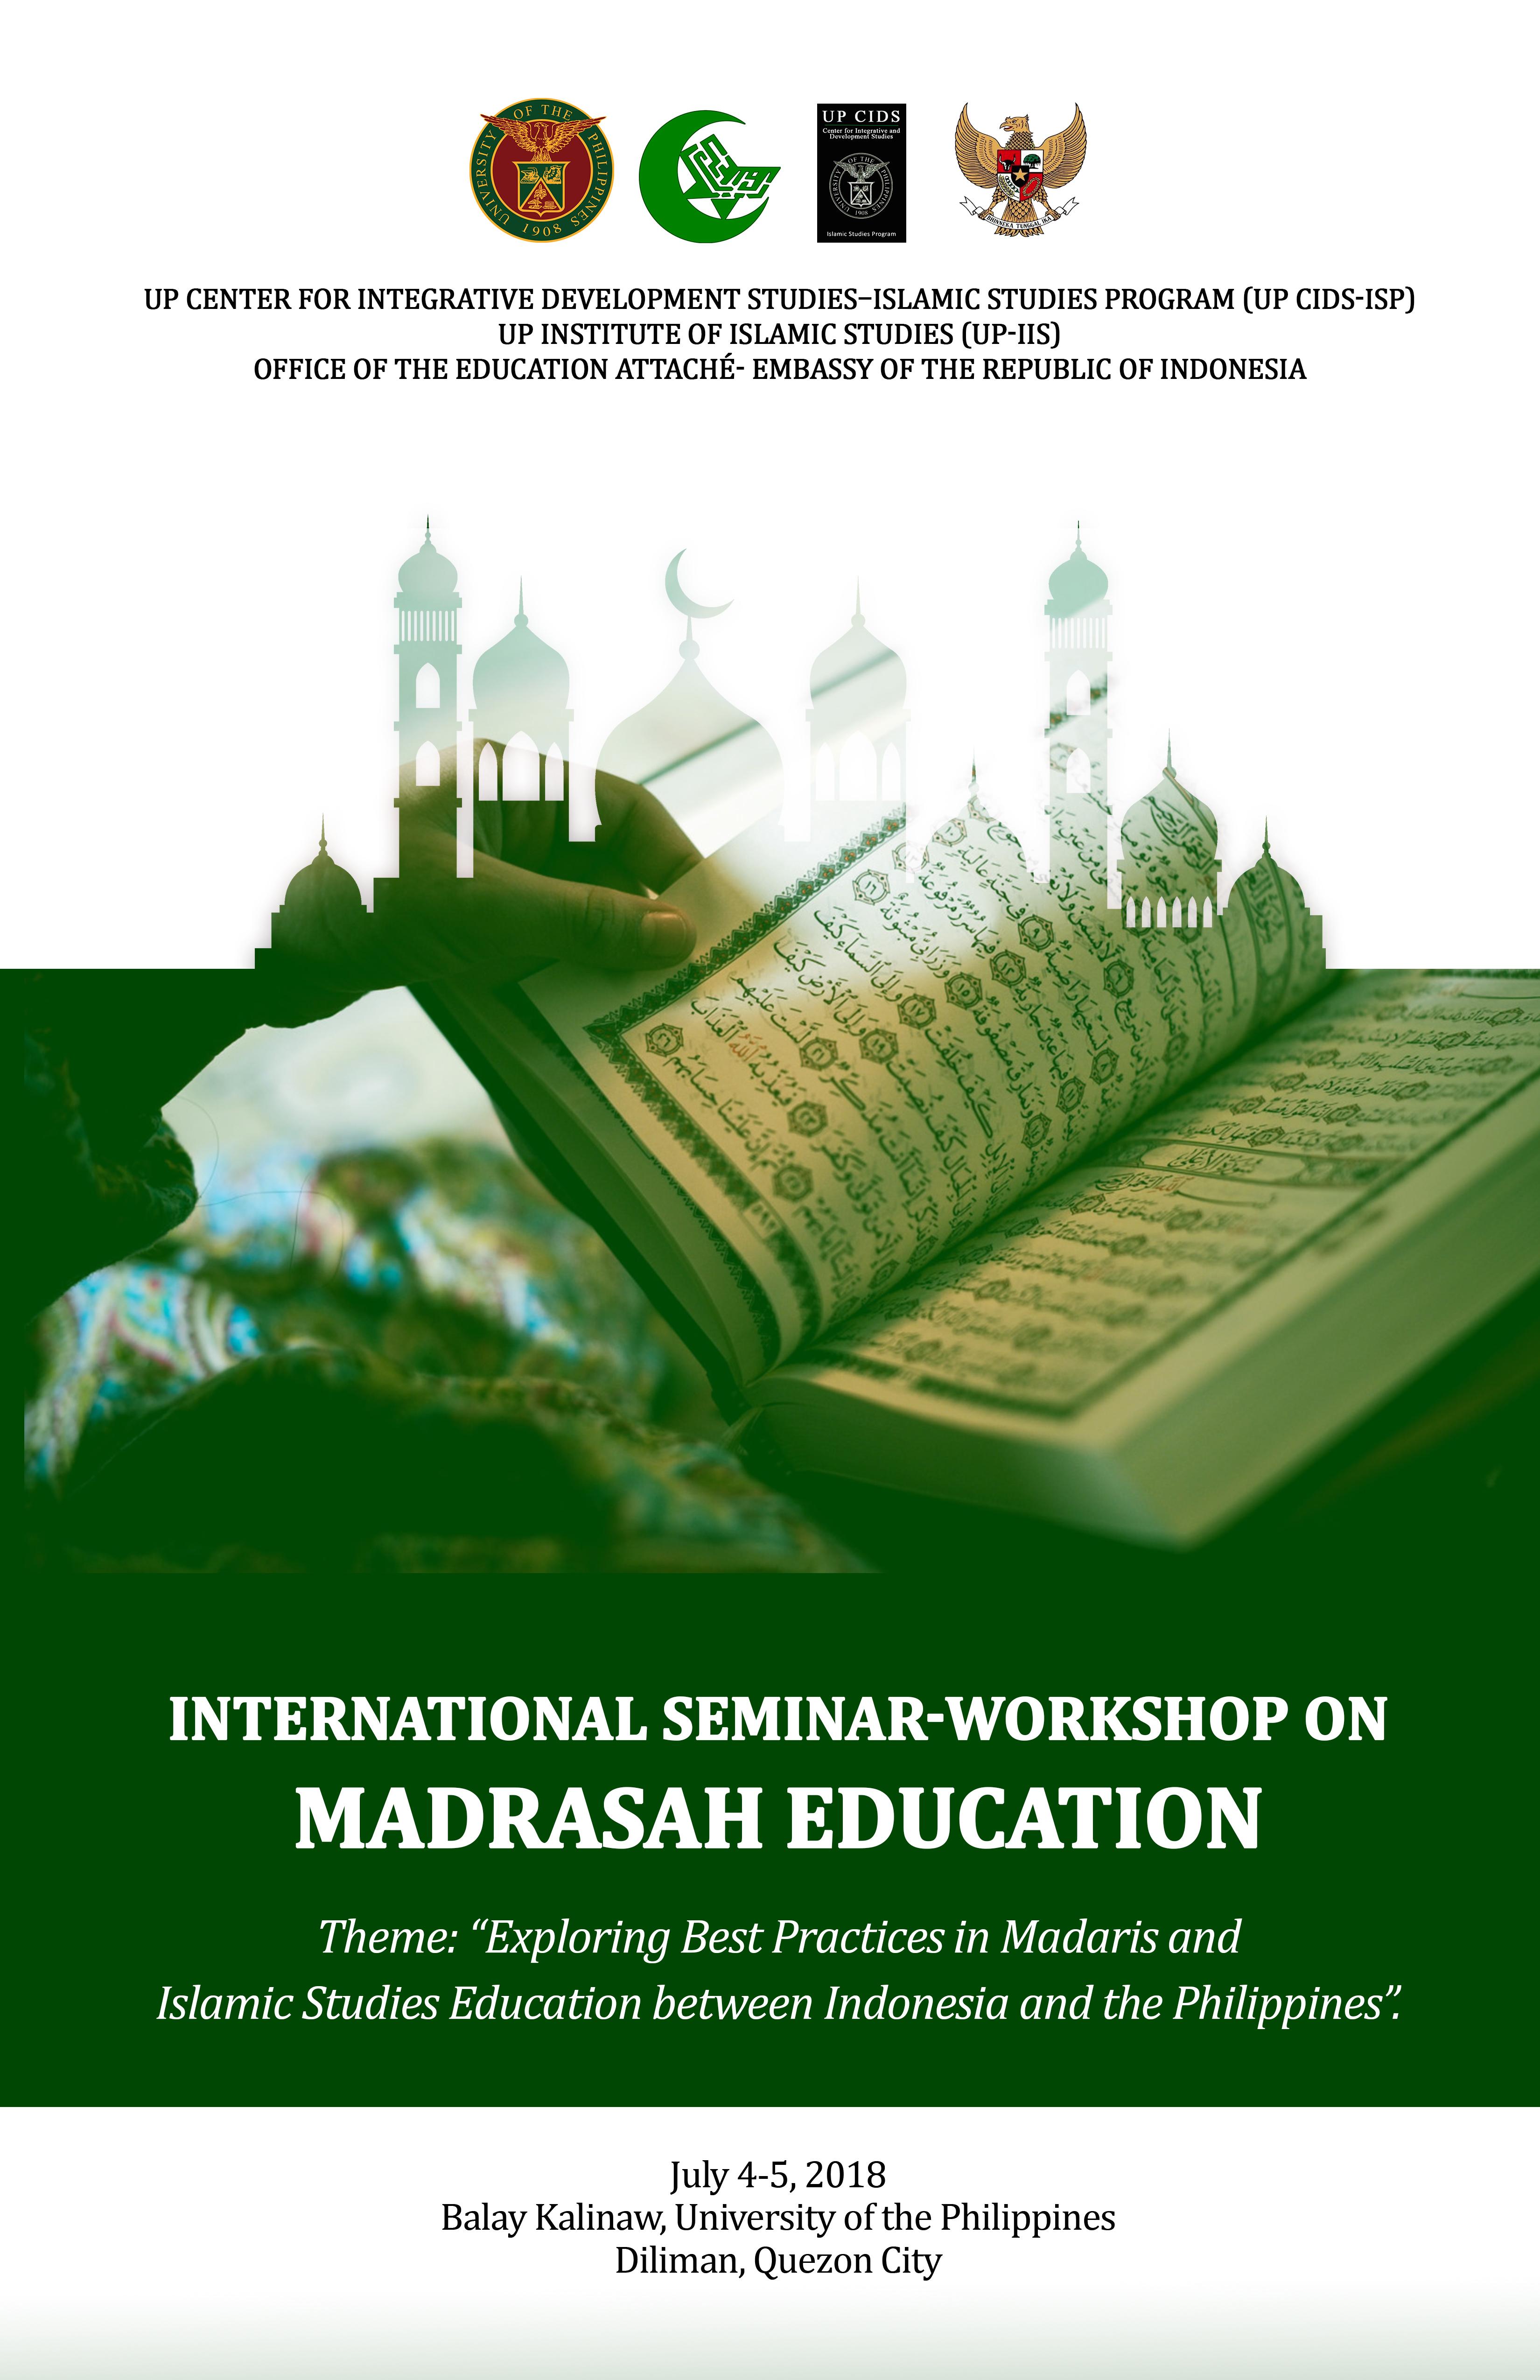 International Seminar-Workshop on Madrasah Education